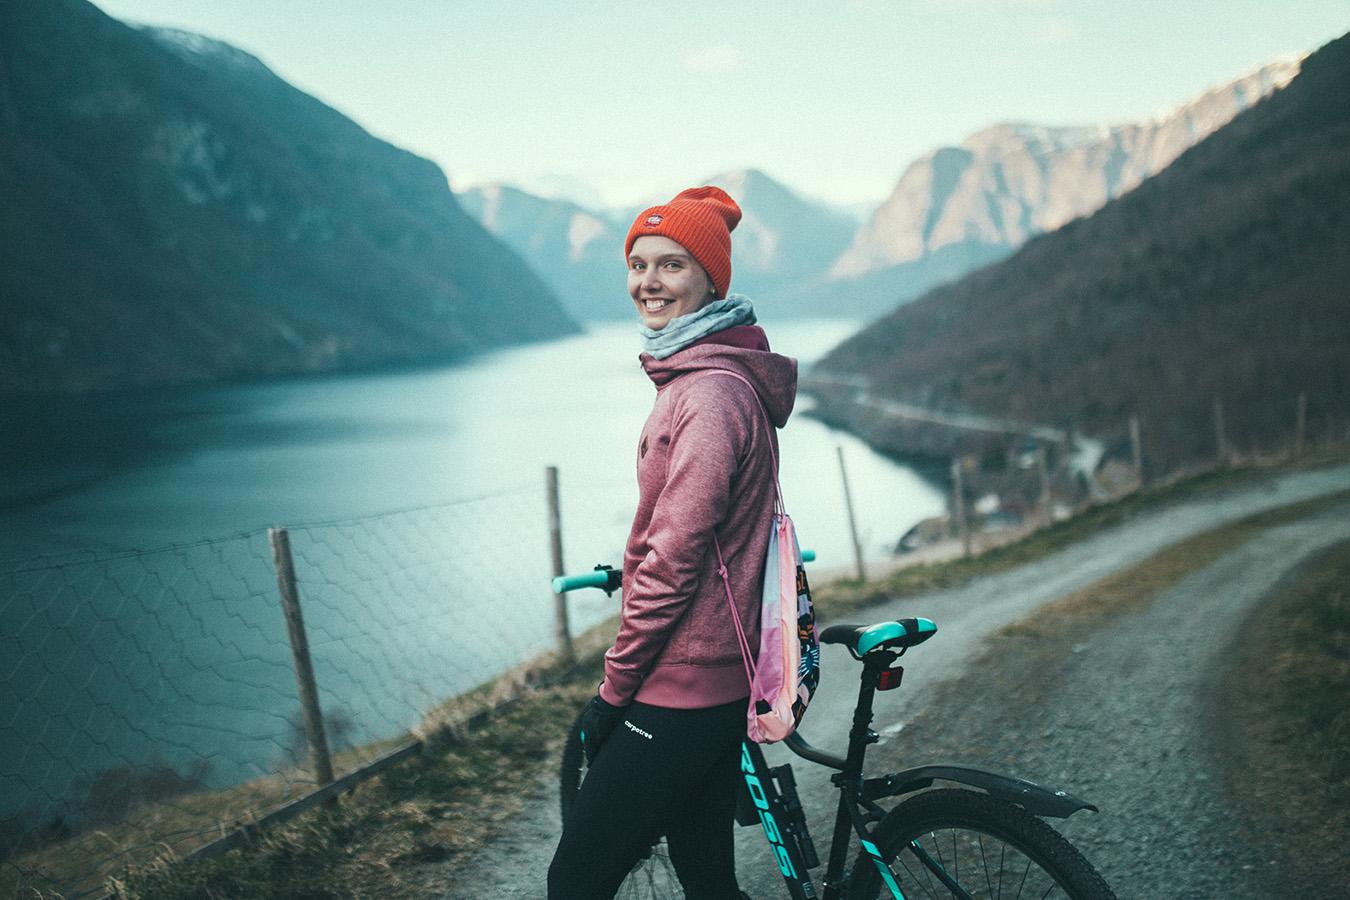 Magda, Otternes, z rowerem Kross